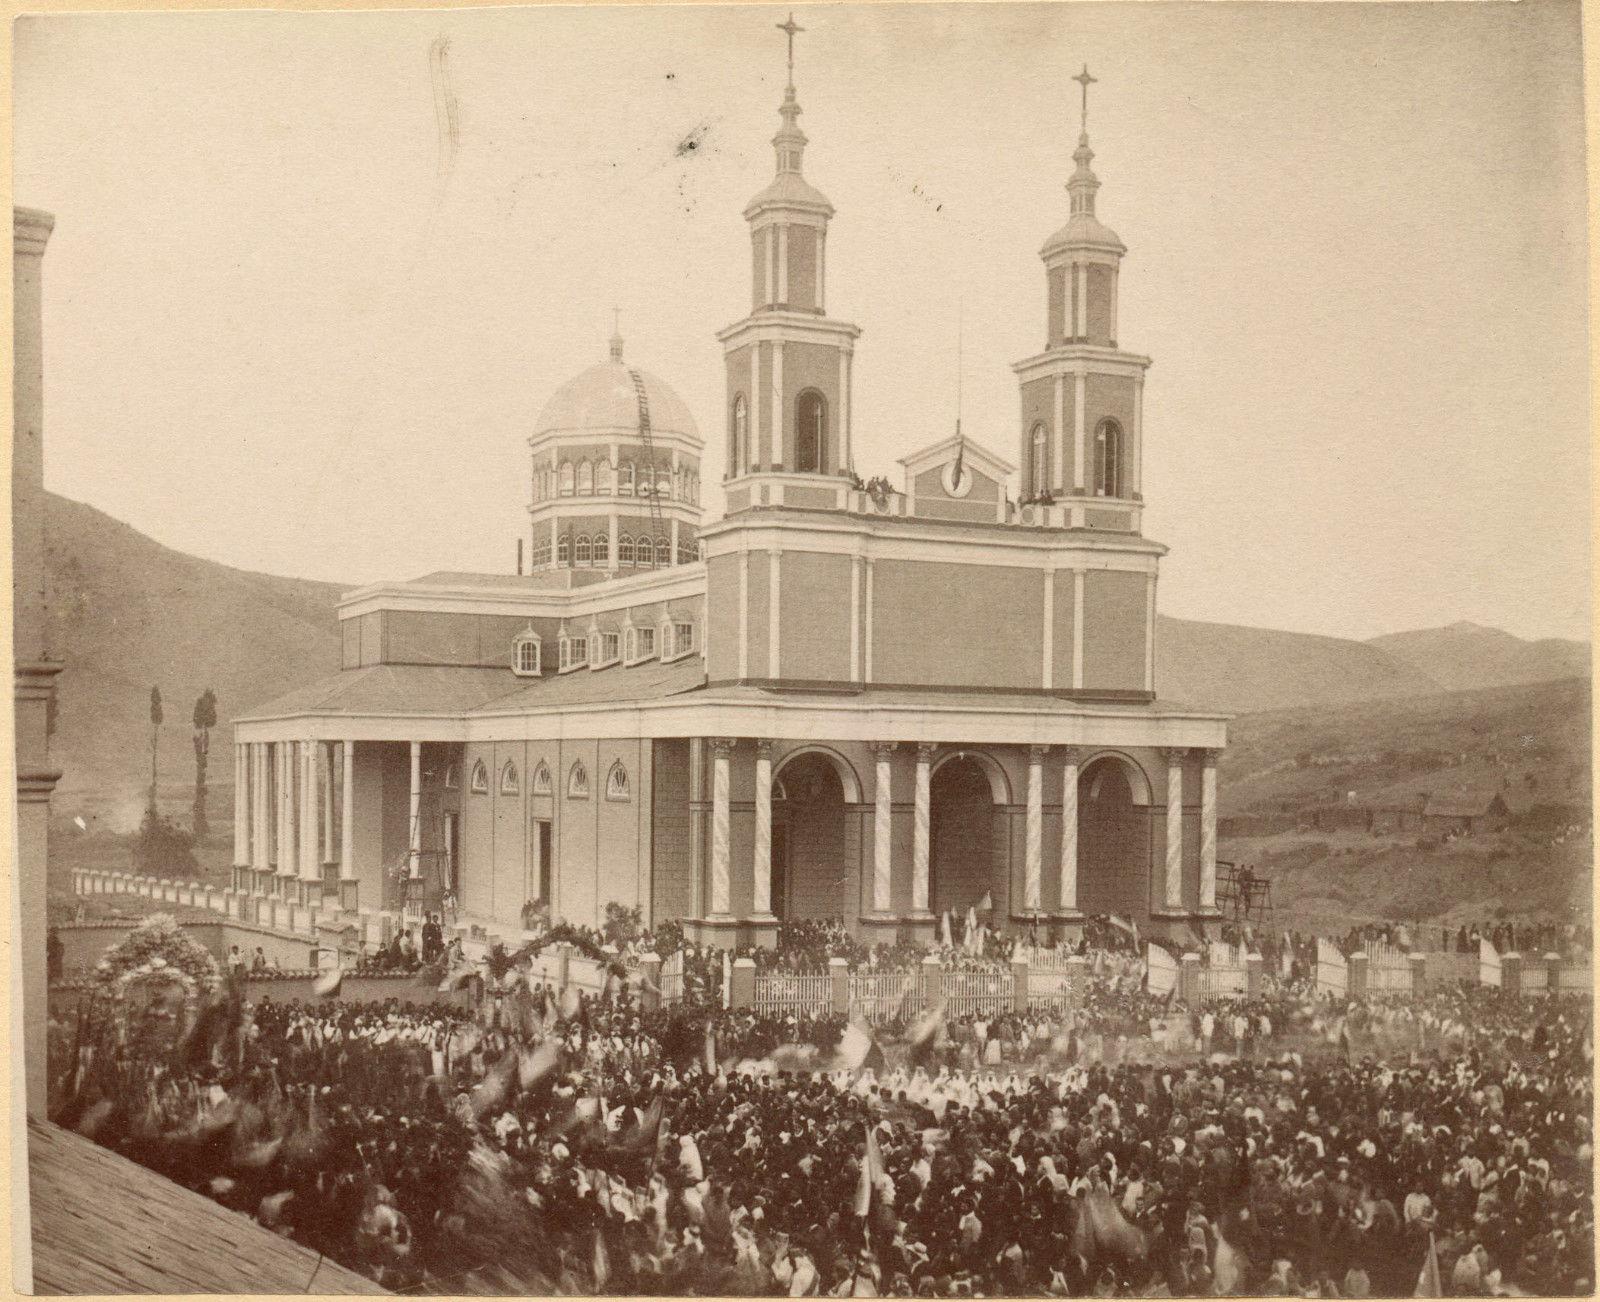 Enterreno - Fotos históricas de chile - fotos antiguas de Chile - Iglesia de Andacollo en 1895